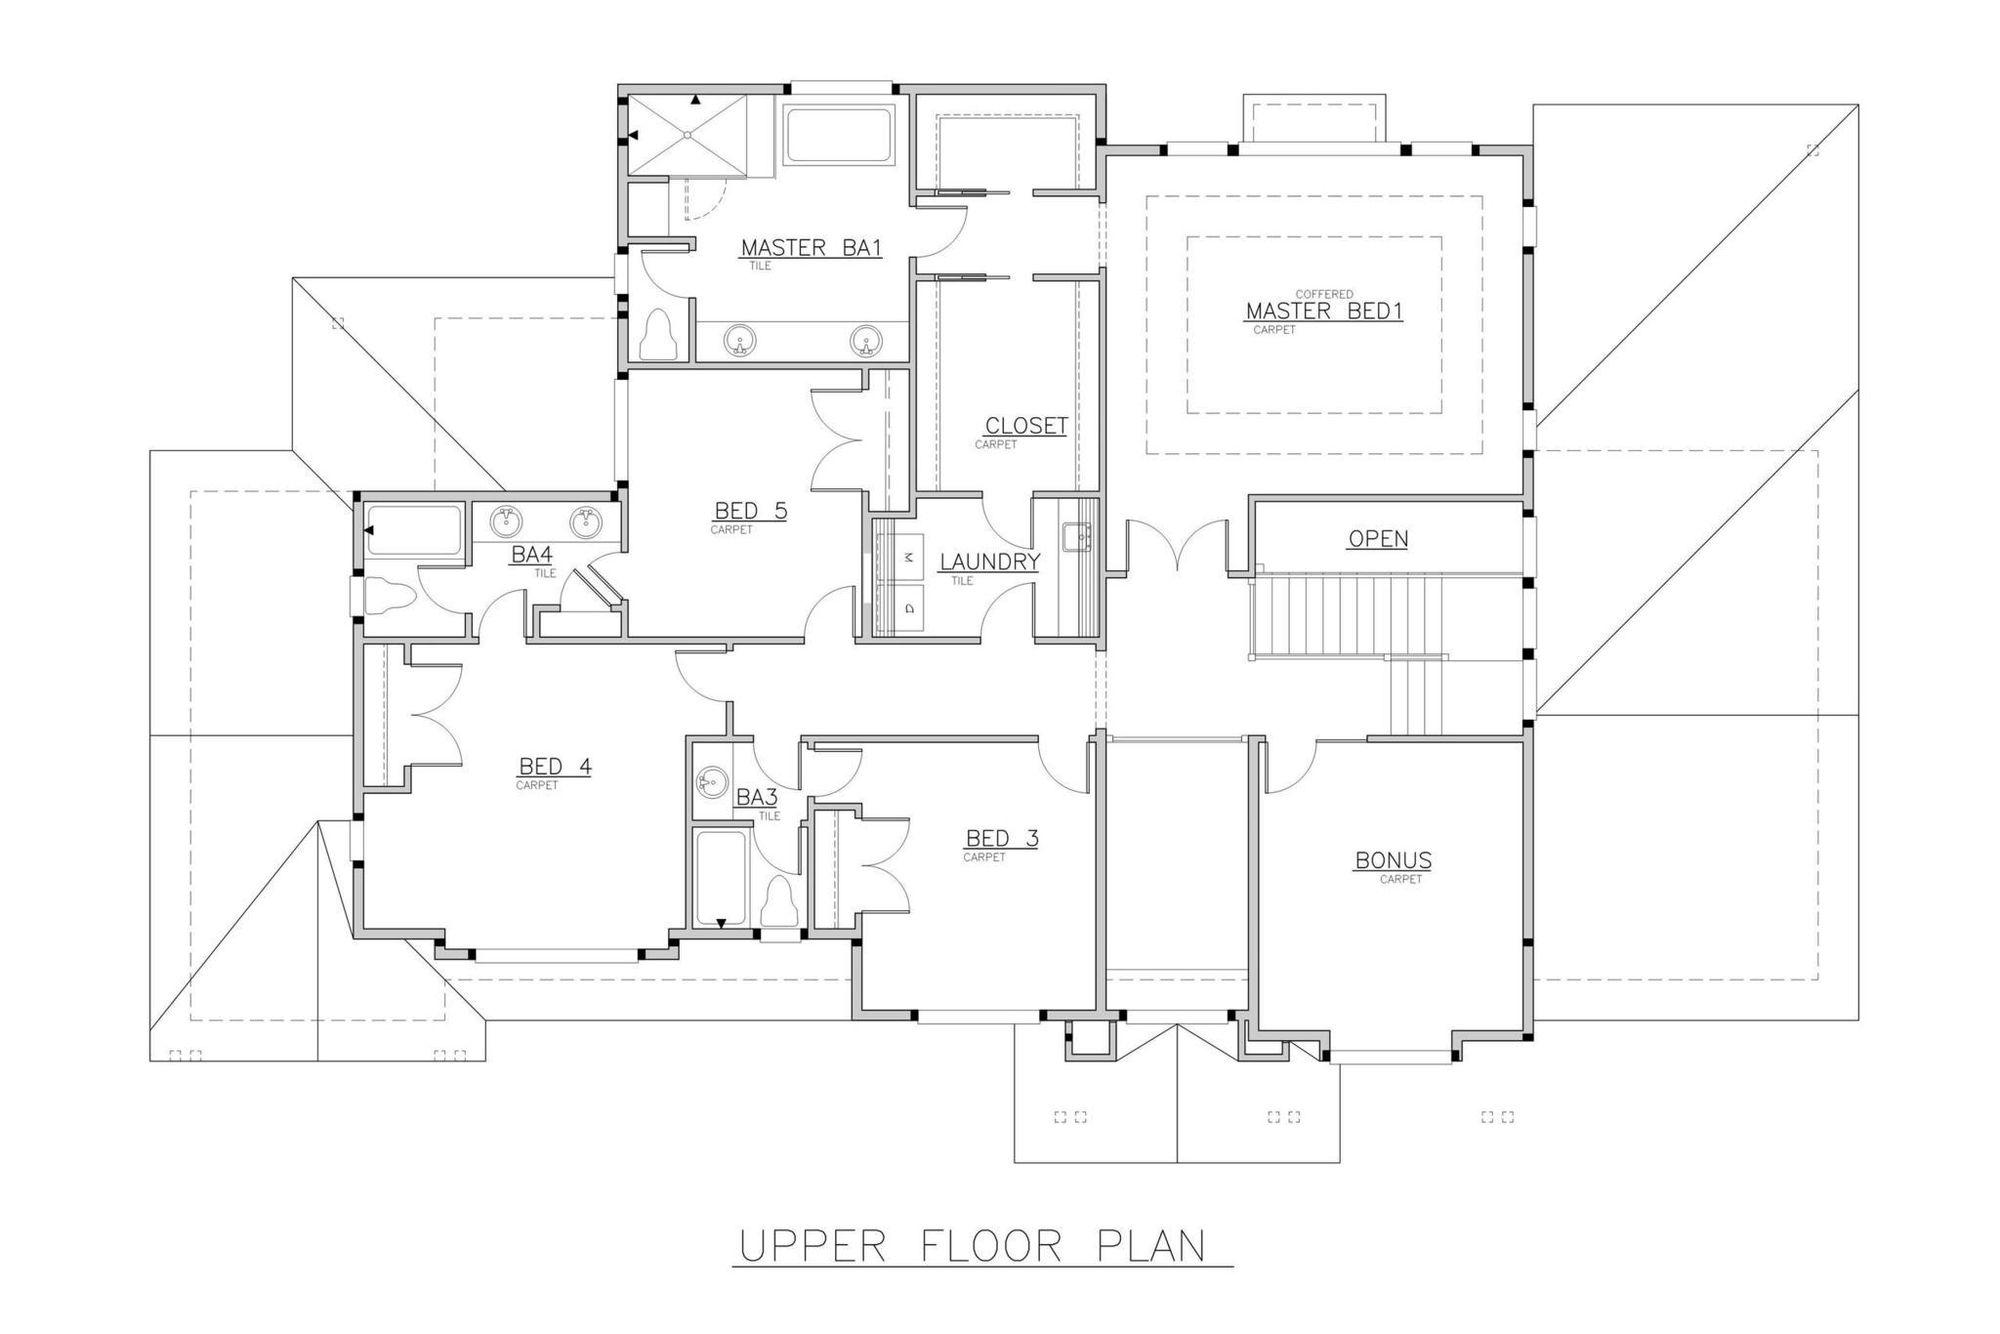 Sydney Nouveau C Upper Floor